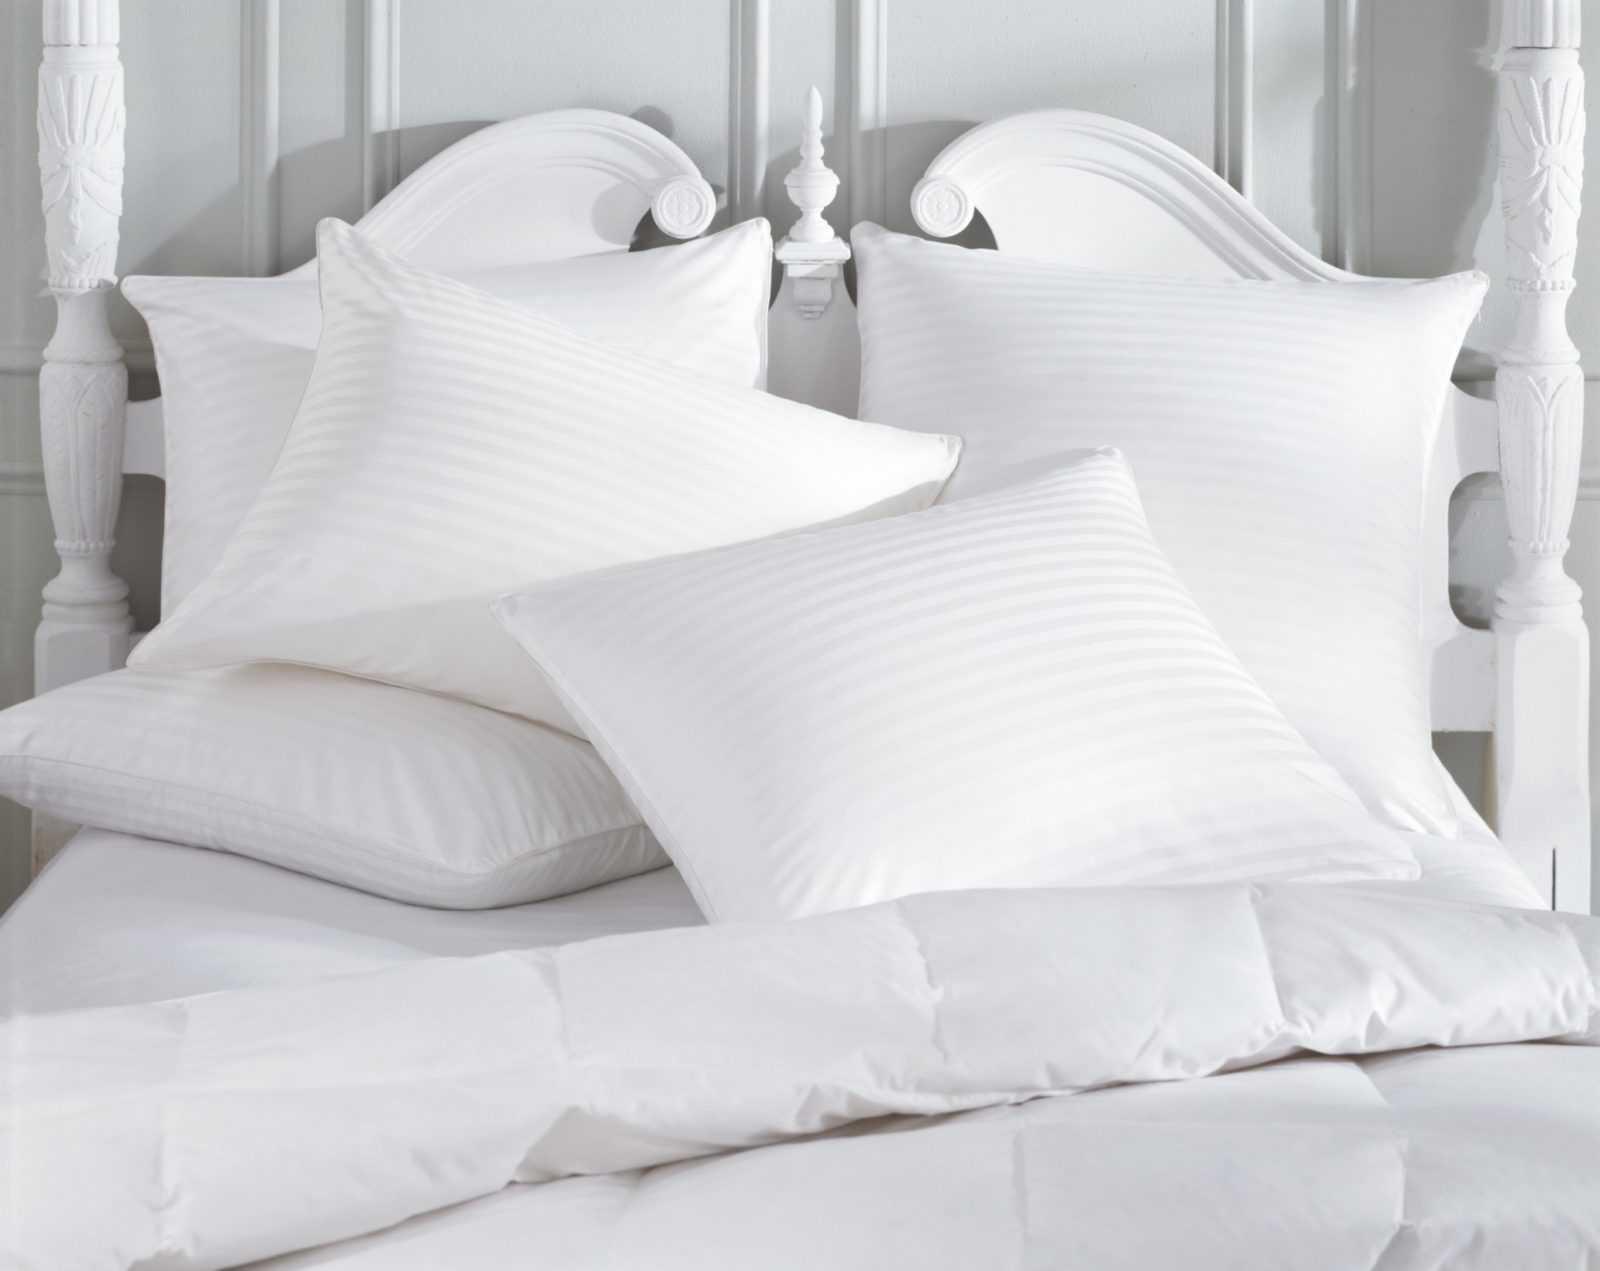 cama con almohada